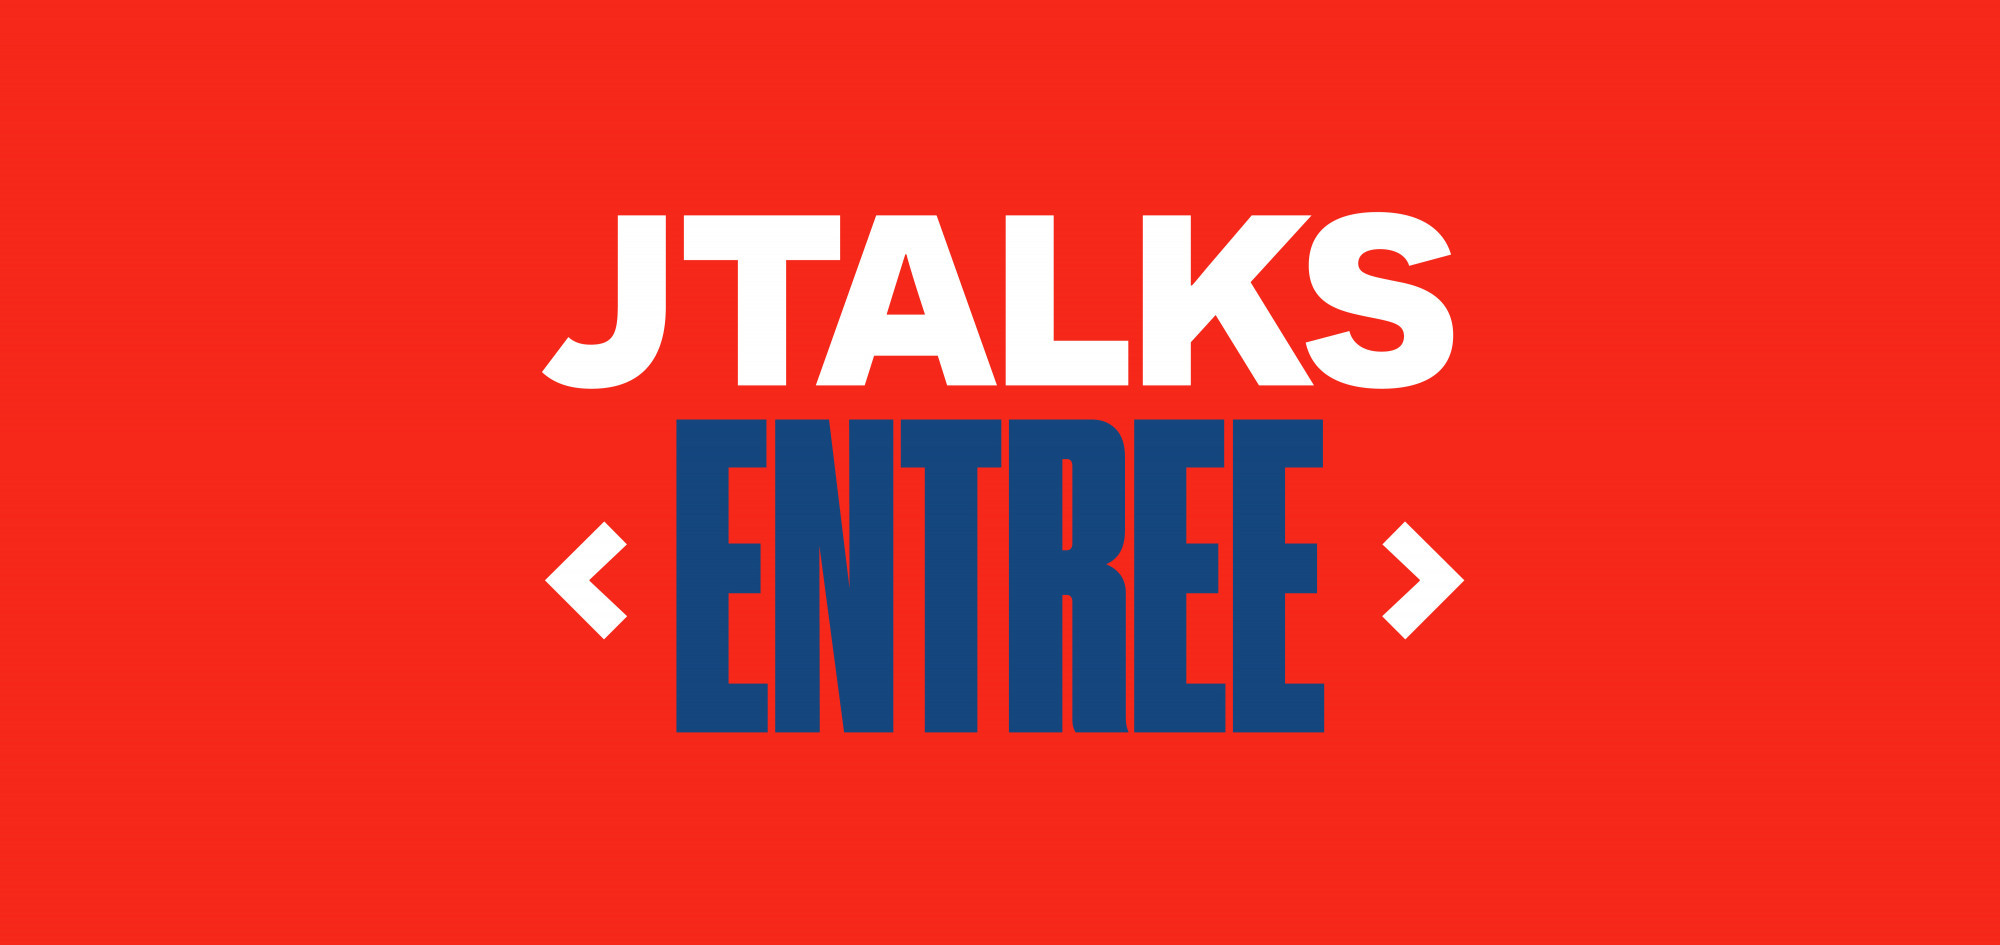 [ONLINE] Jouska Talks Entree: Let's Start Here! - Batch 3